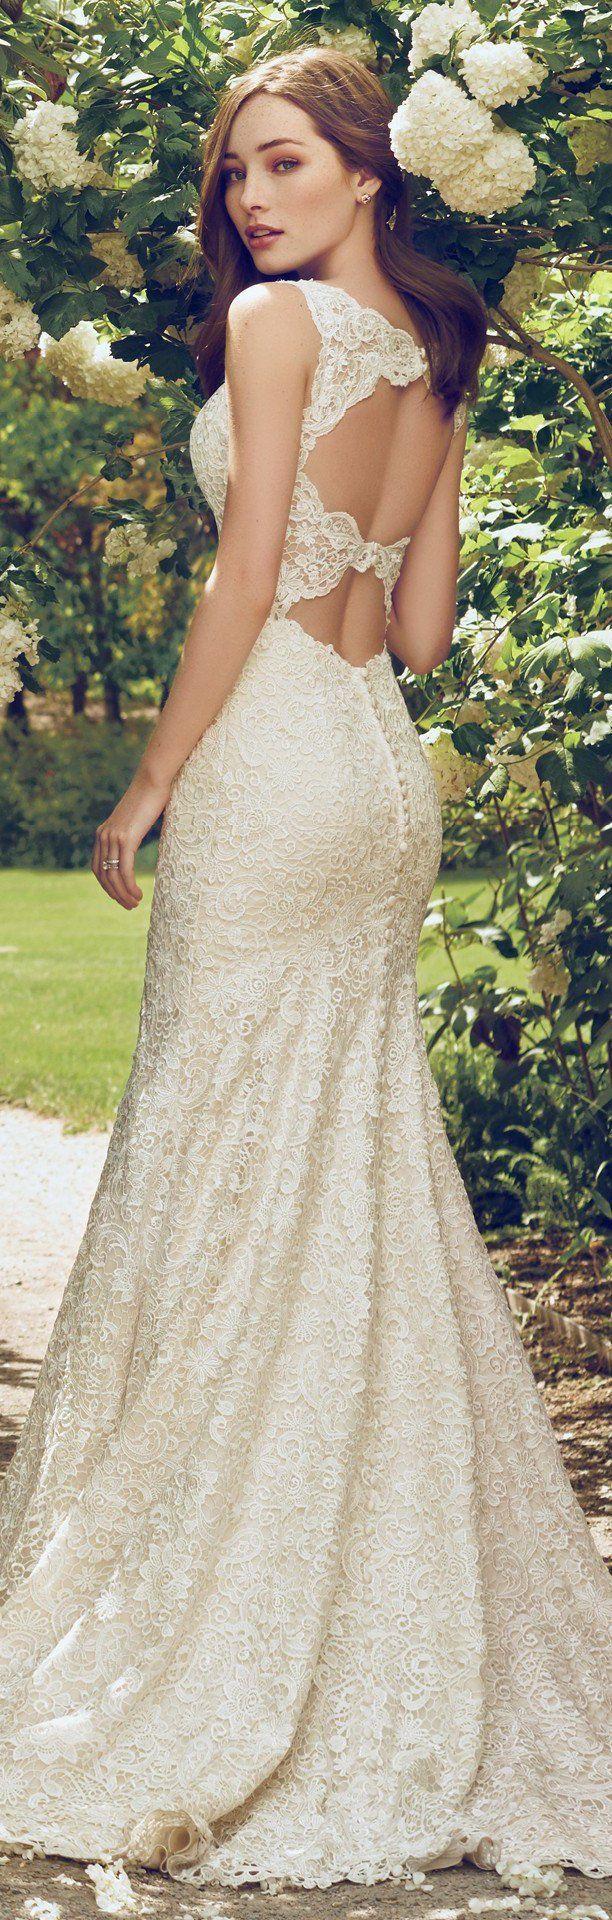 Wedding Dress By Rebecca Ingram